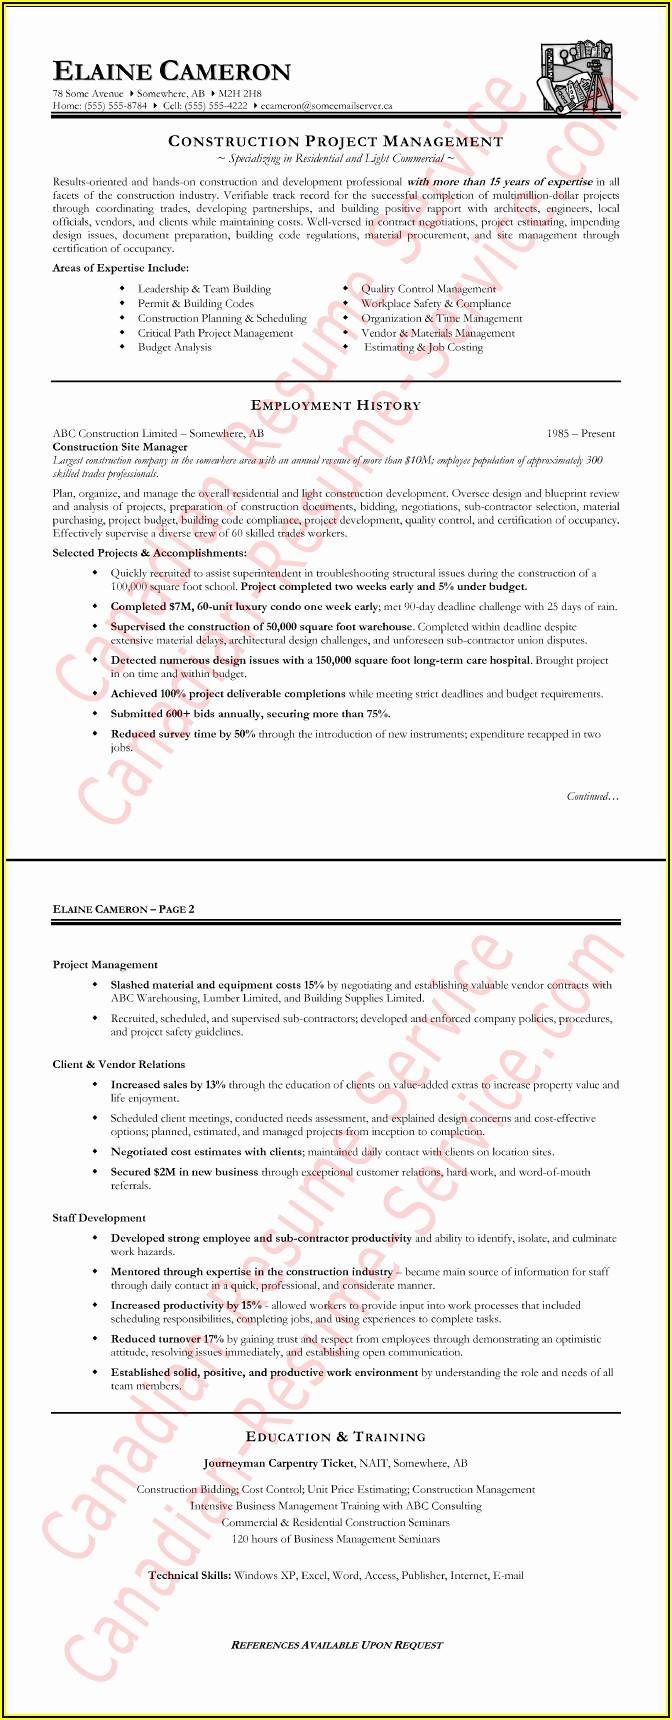 Resume Templates Construction Management